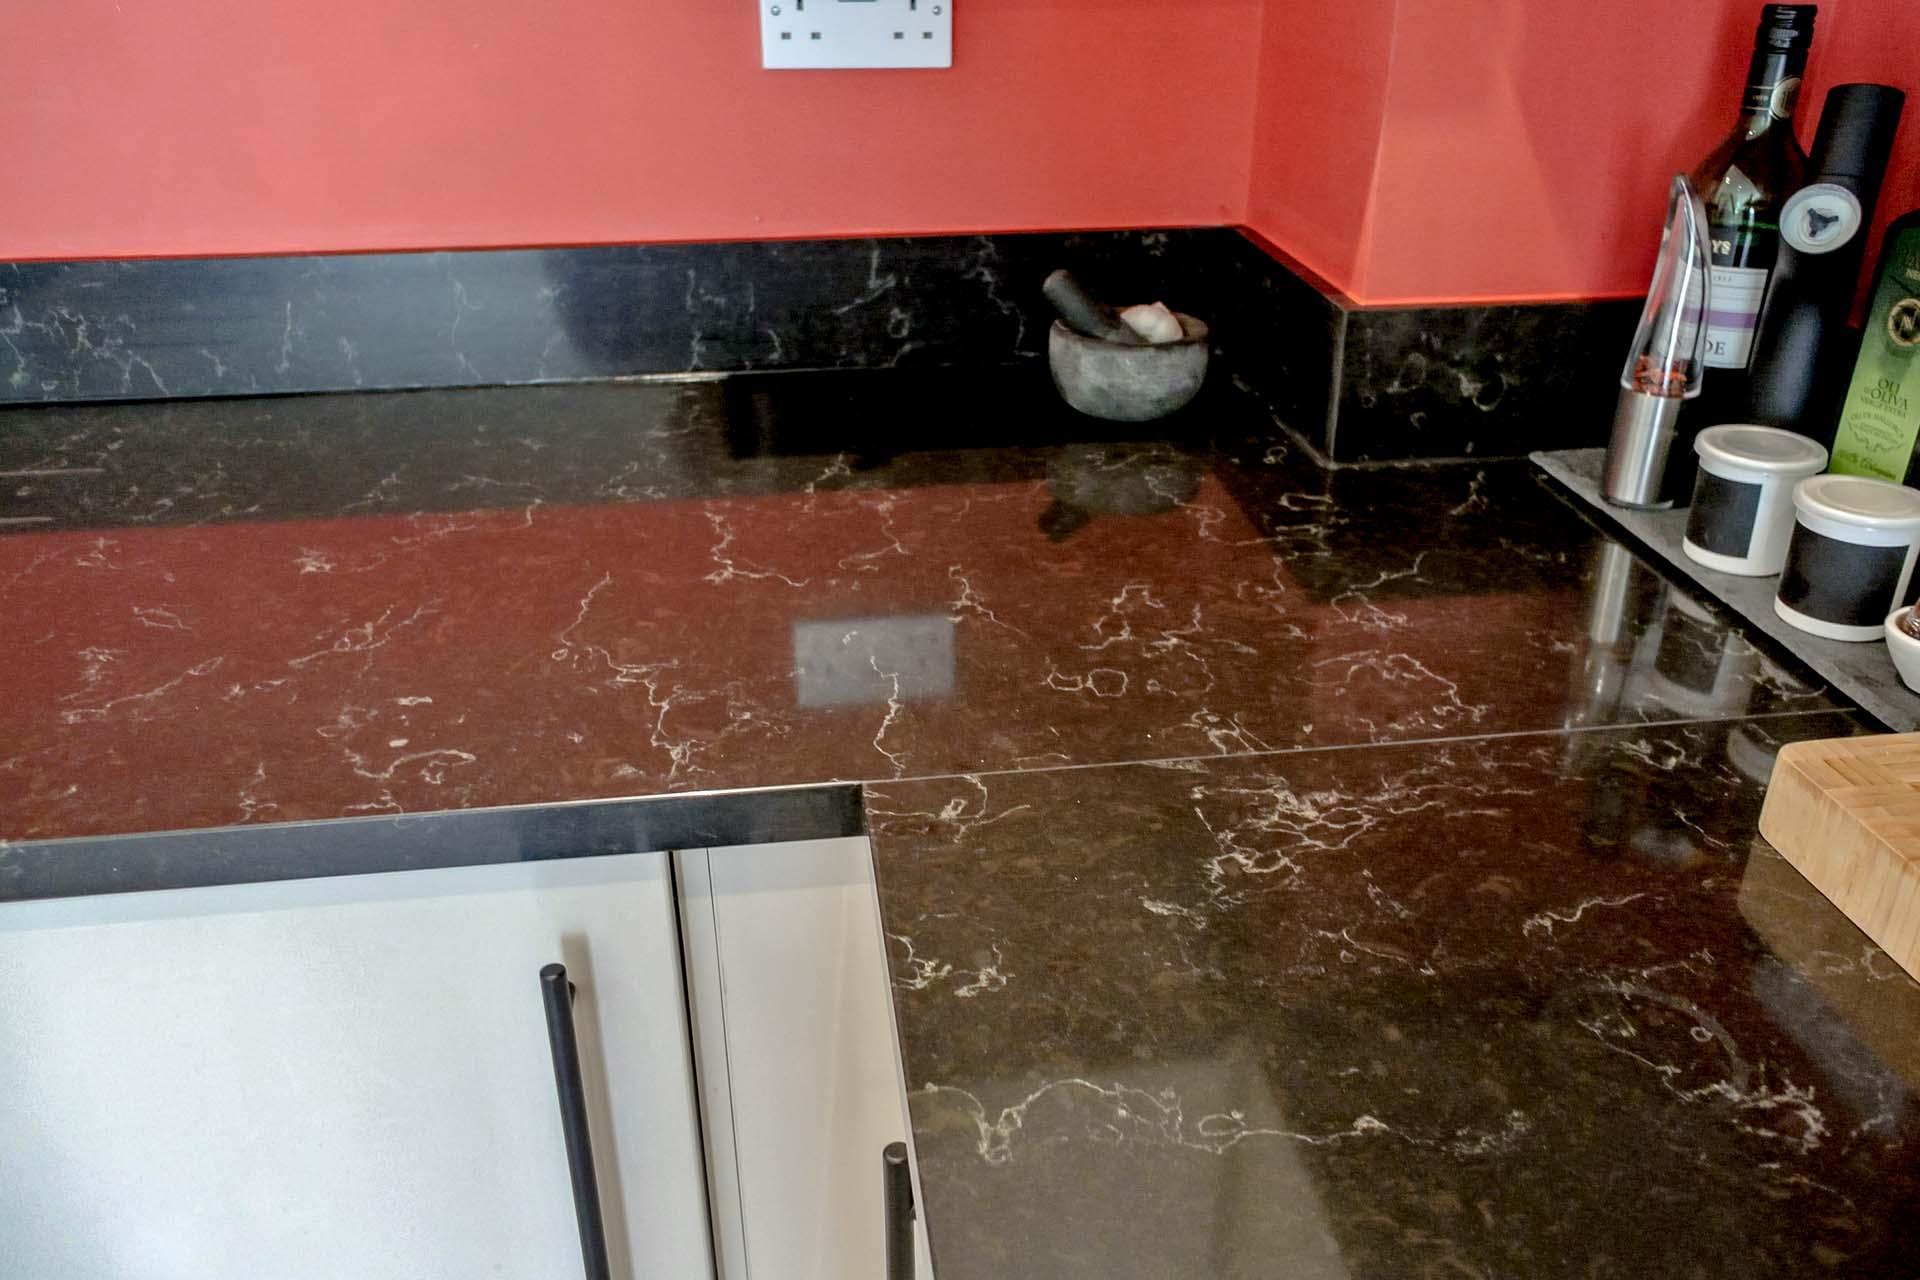 Unistone Java Black Noir Quartz Worktops Surrey Reigate Granite Franke SID160 Tectonite sink 094236